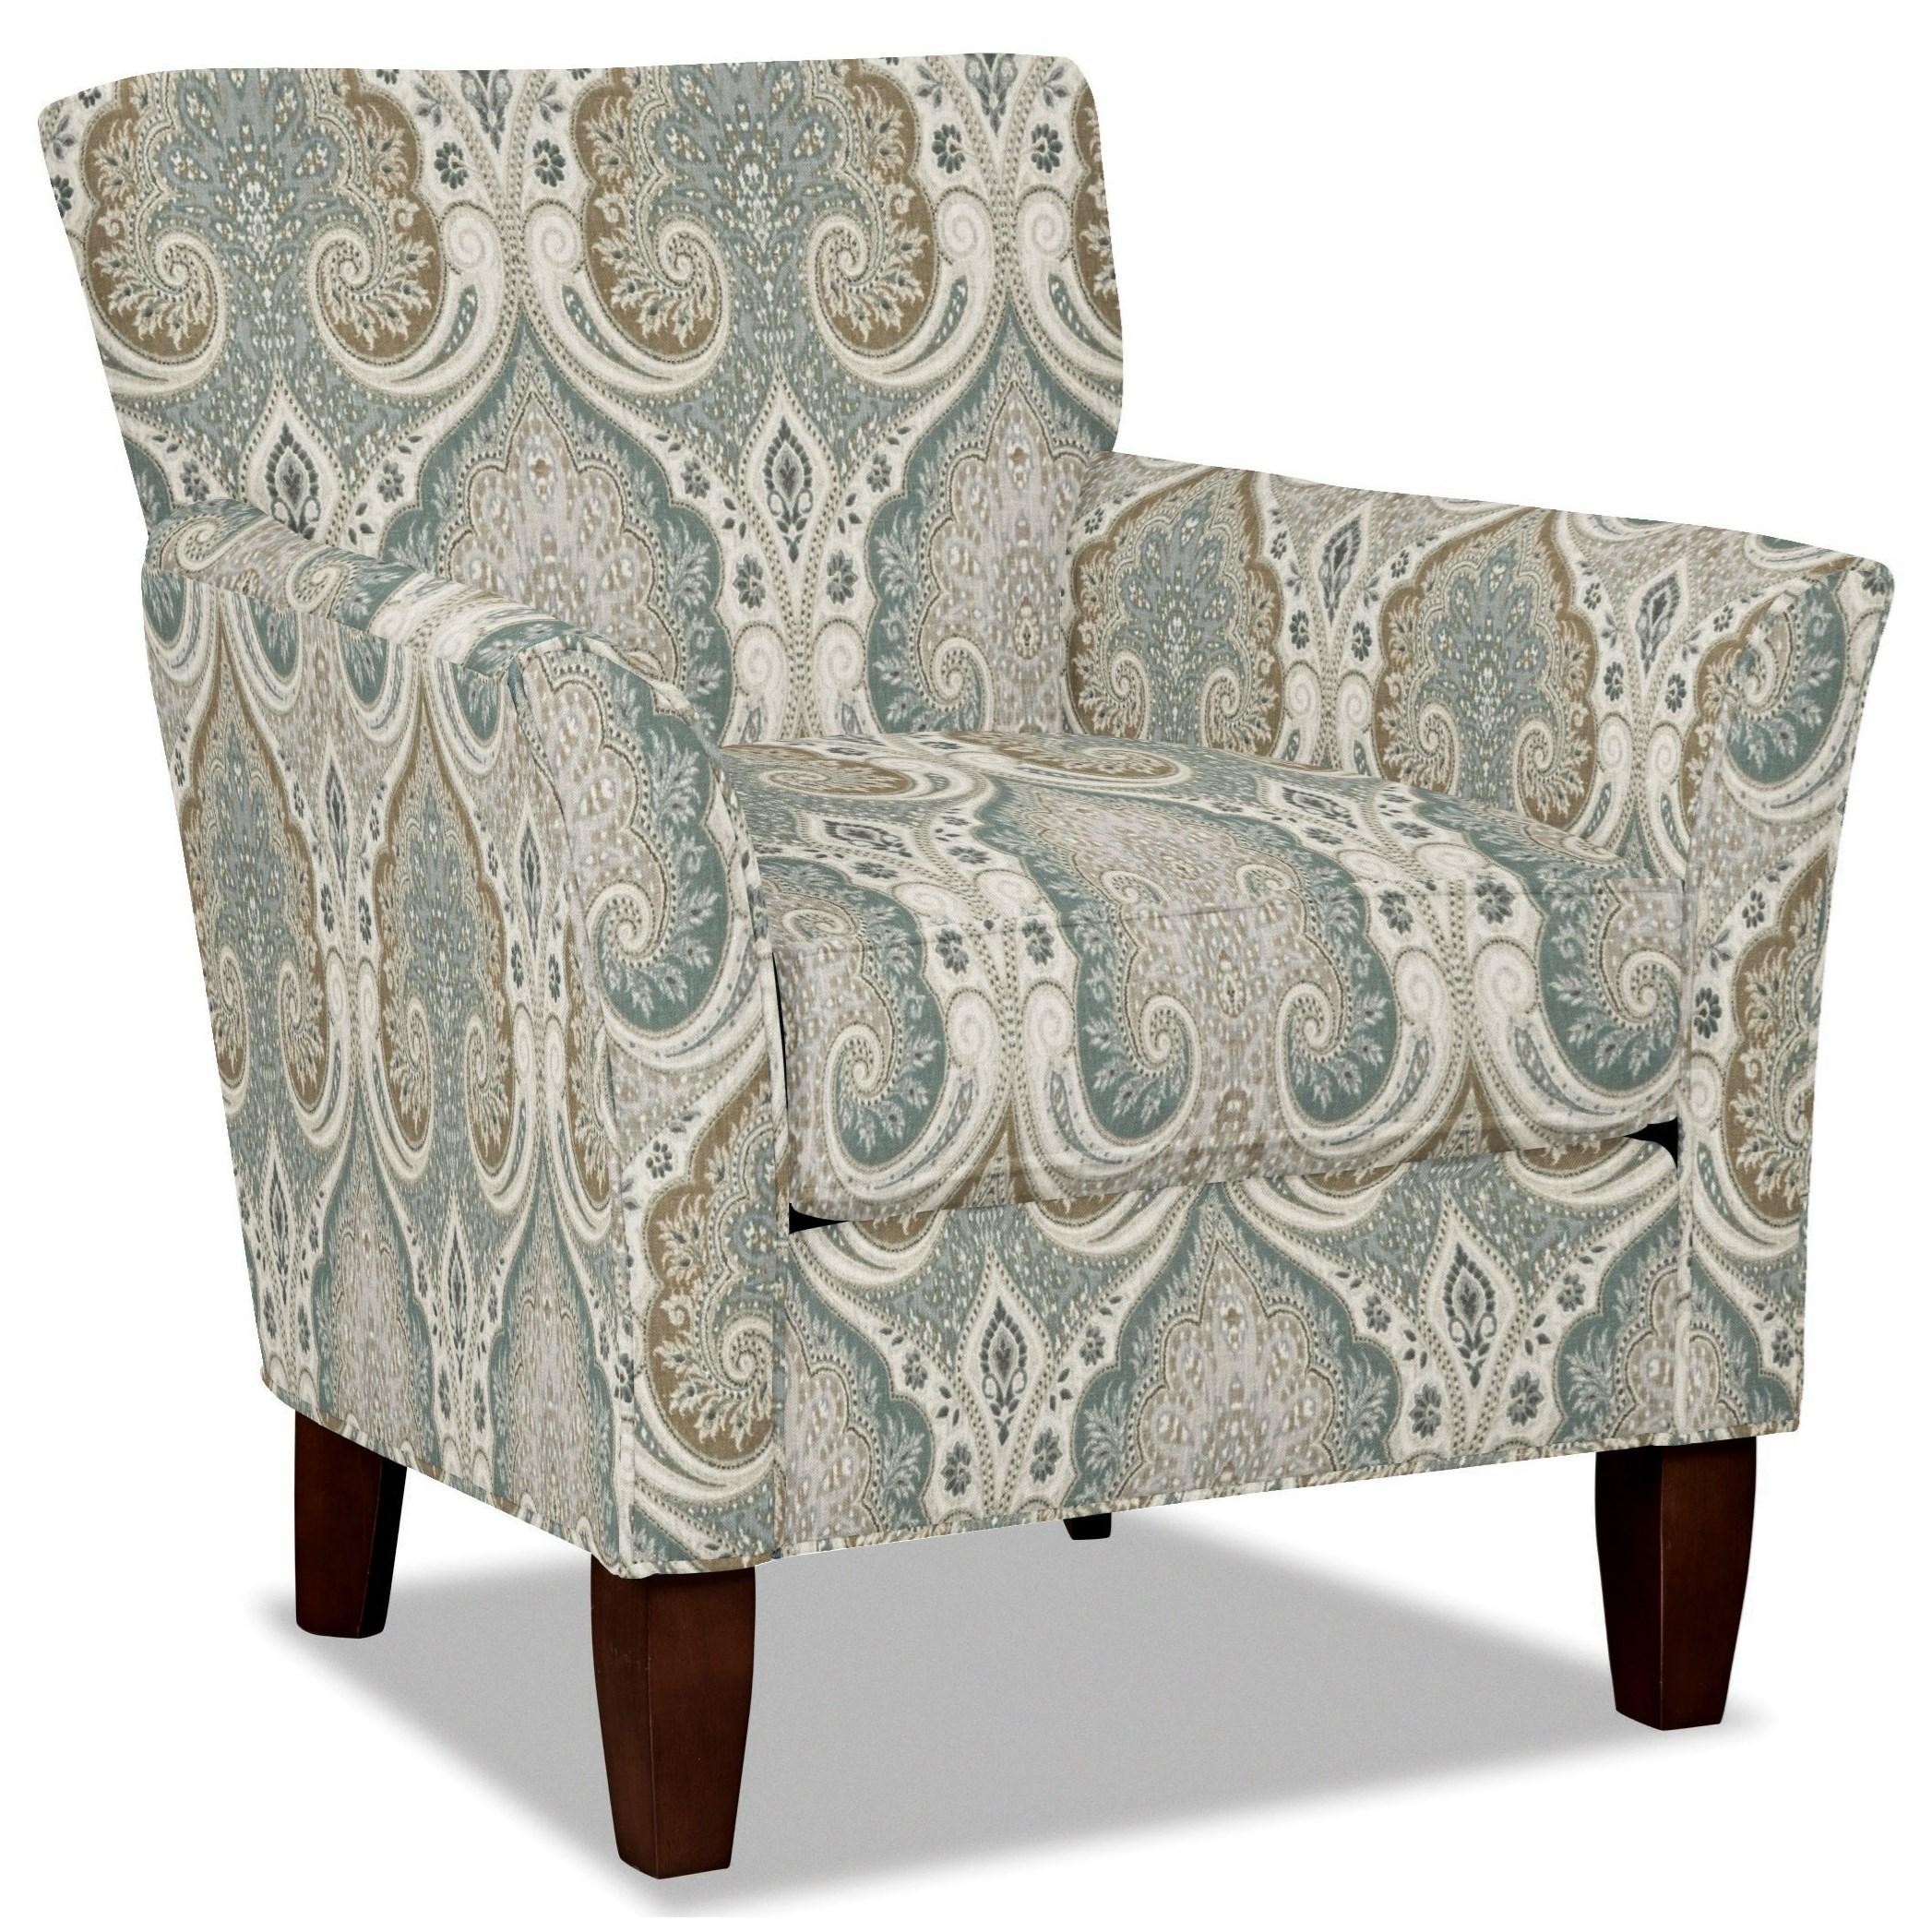 Craftmaster 060110 Accent Chair - Item Number: 060110-LATIKA-21